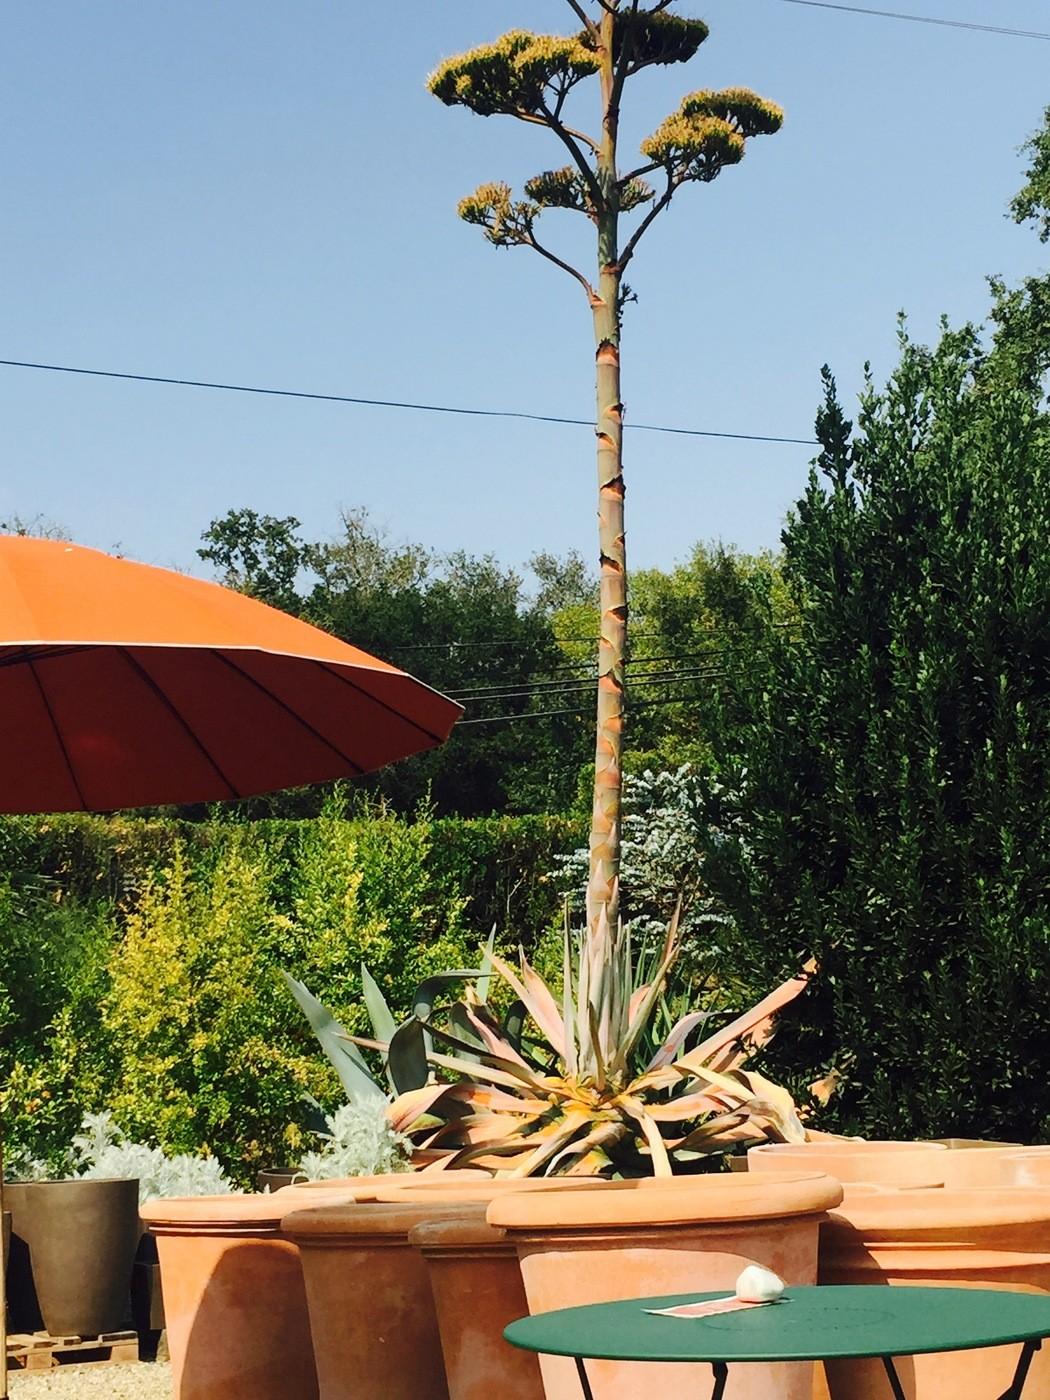 Agave Plant at The Gardener in Healdsburg